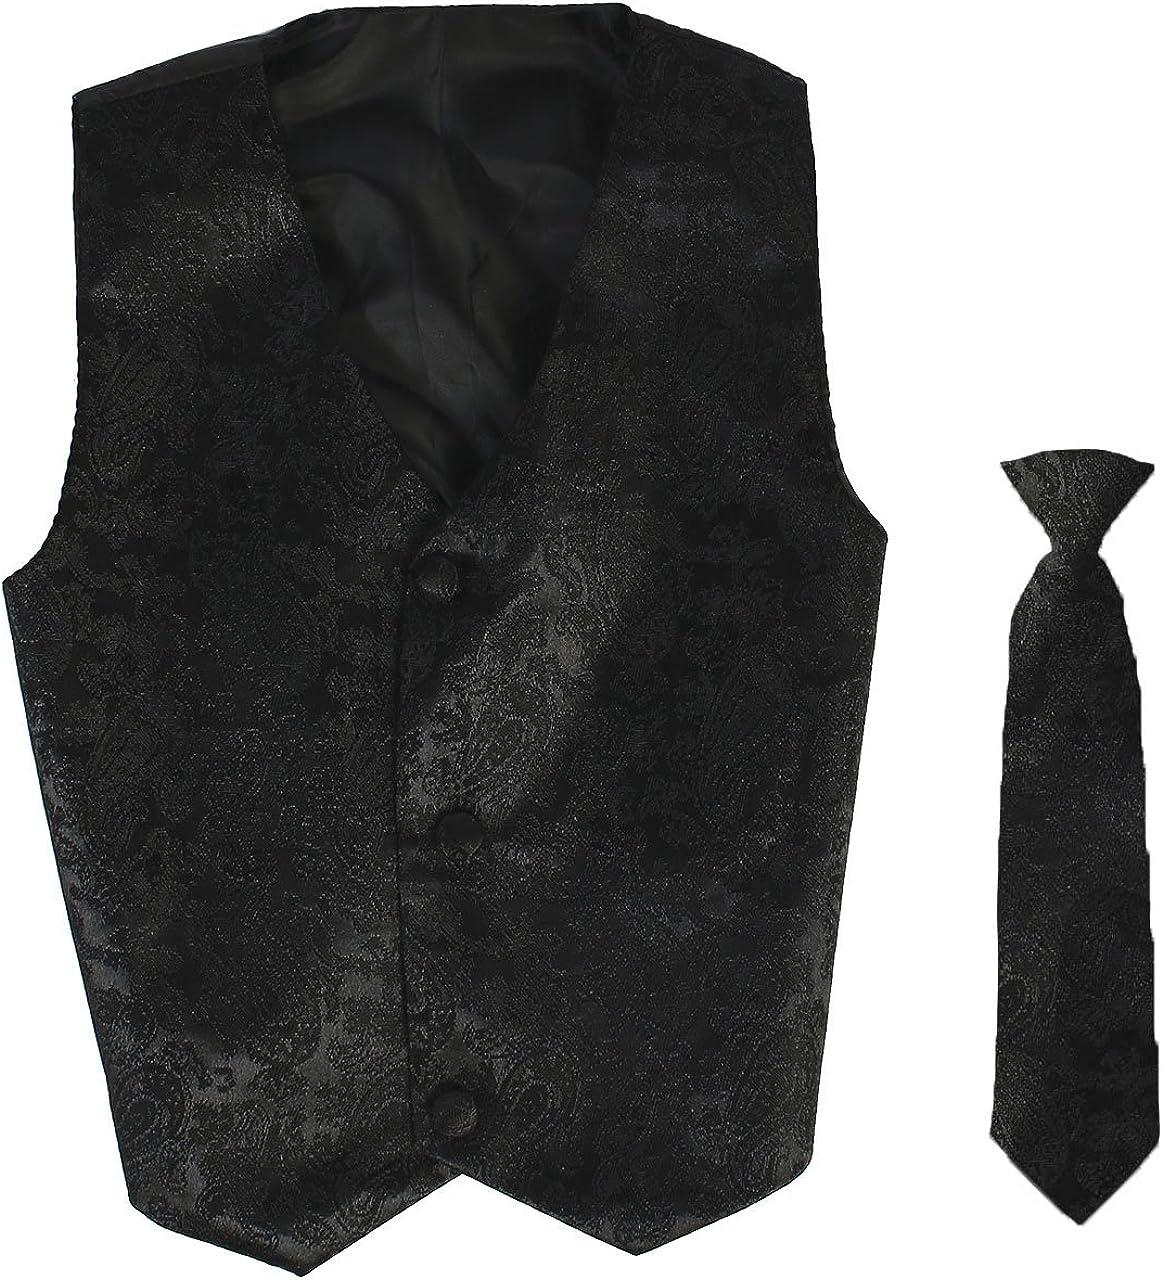 Vest and Clip On Necktie Set-Multiple Colors-Baby Infant Toddler Boys Sizes